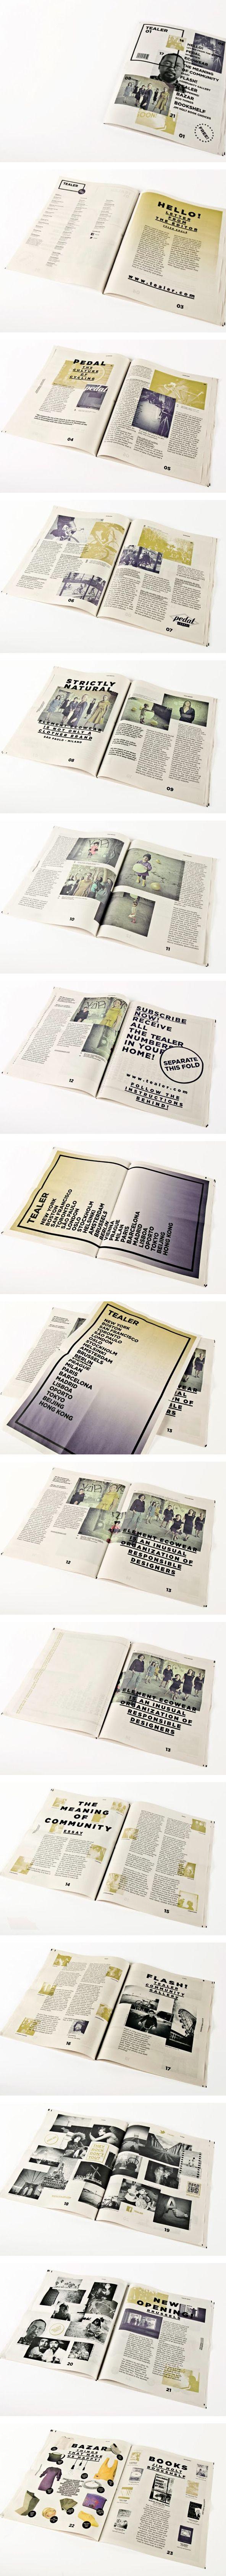 Tealer Brand - Newspaper by Margarida Borges